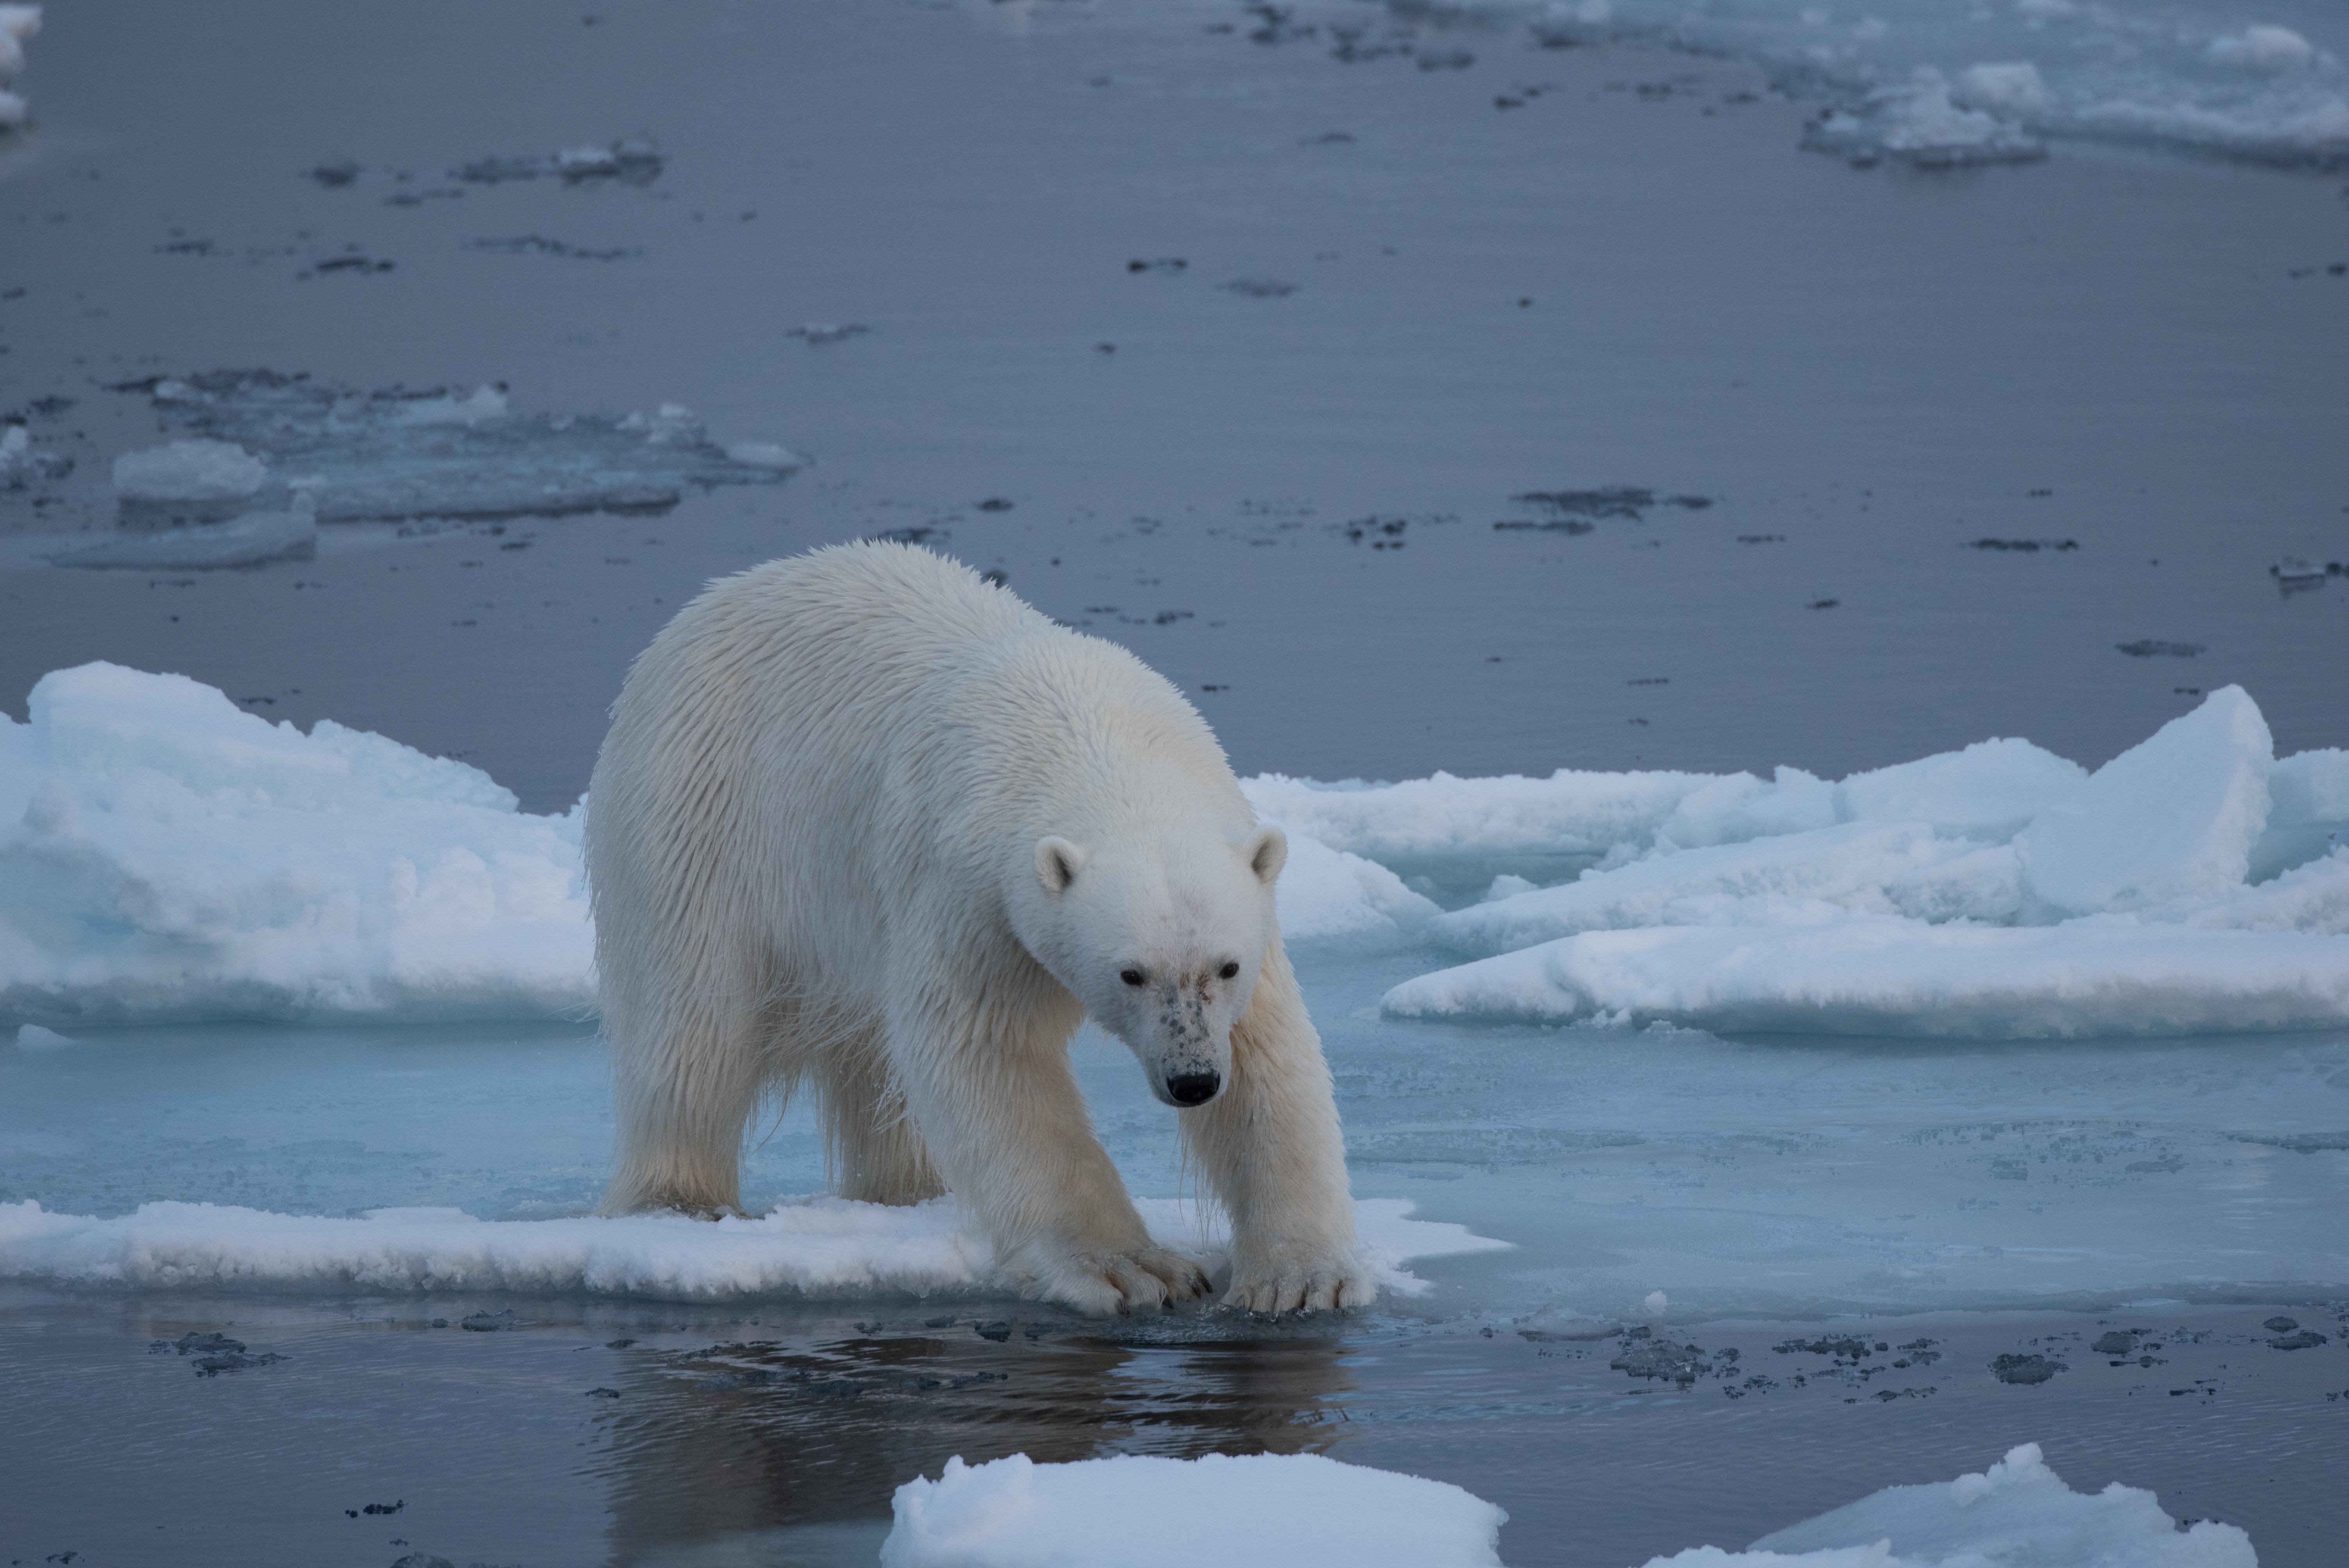 A polar bear stepping onto sea ice. Melting Arctic sea ice may not only threaten the habitat of animals like polar bears but